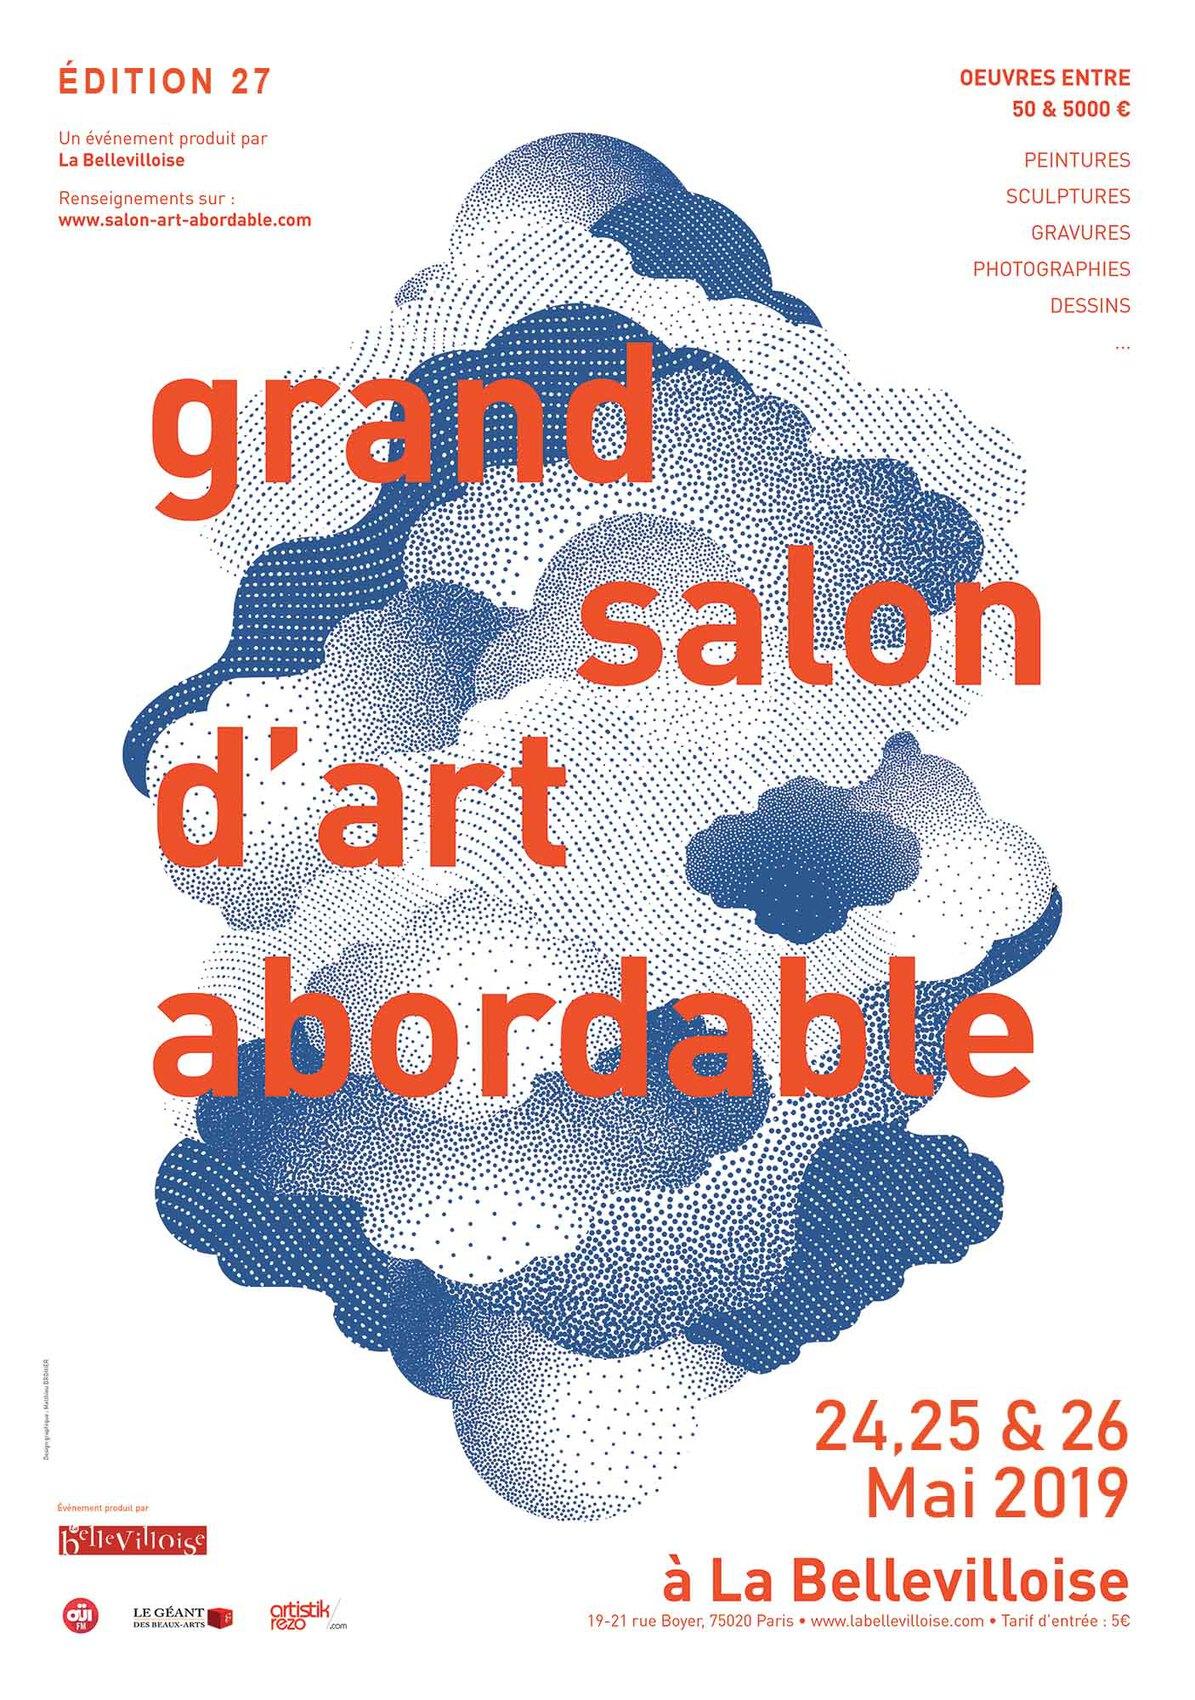 Grand salon d'art abordable